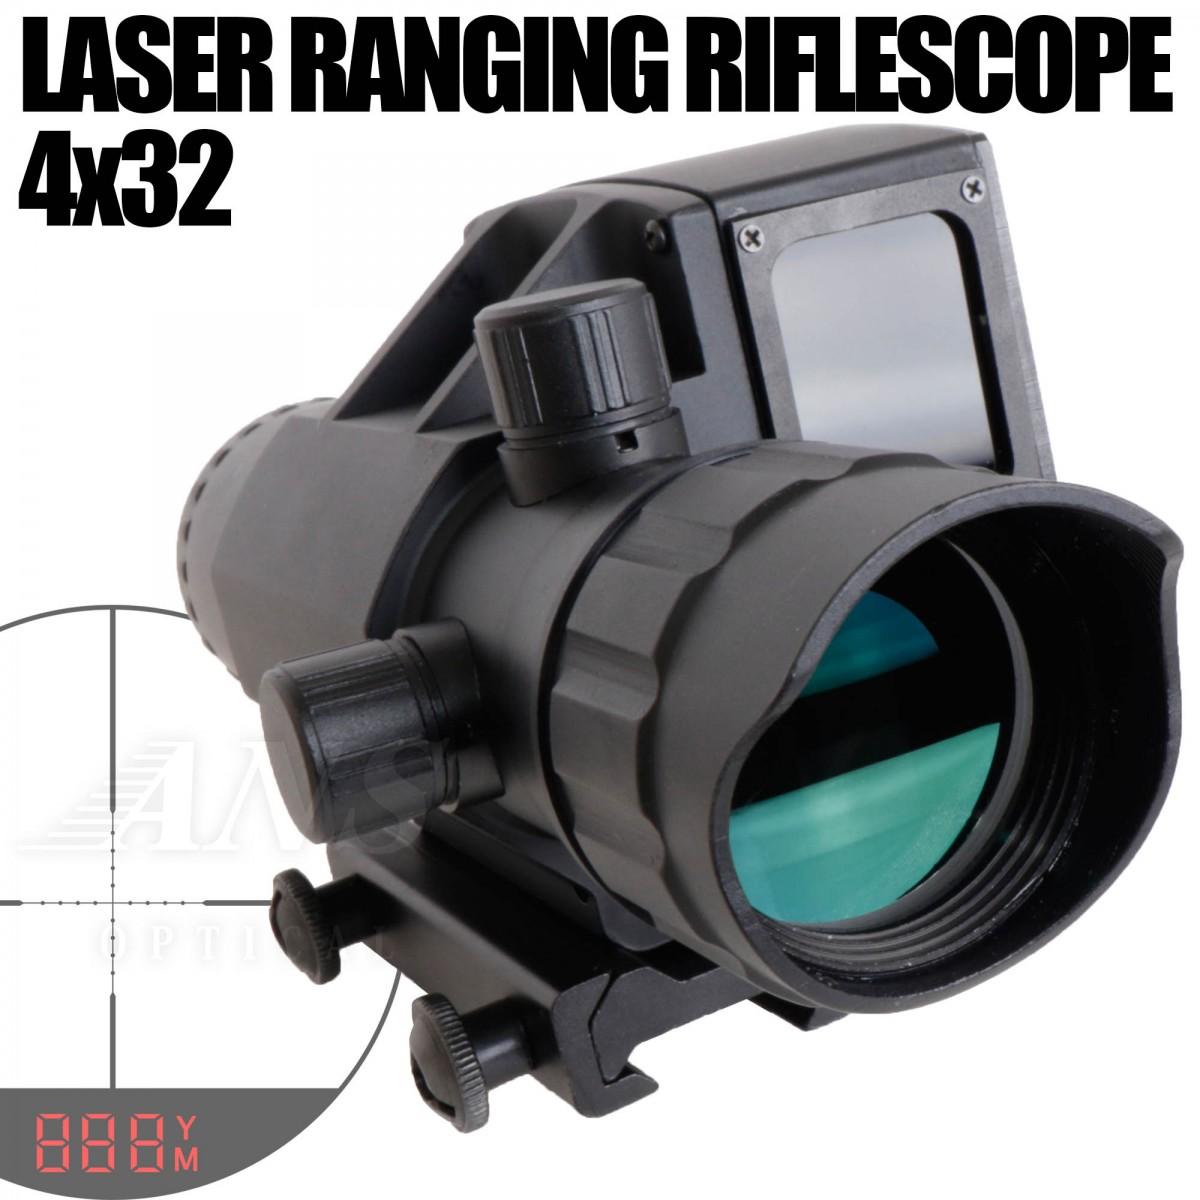 4x32 レーザー距離測定器 スコープ